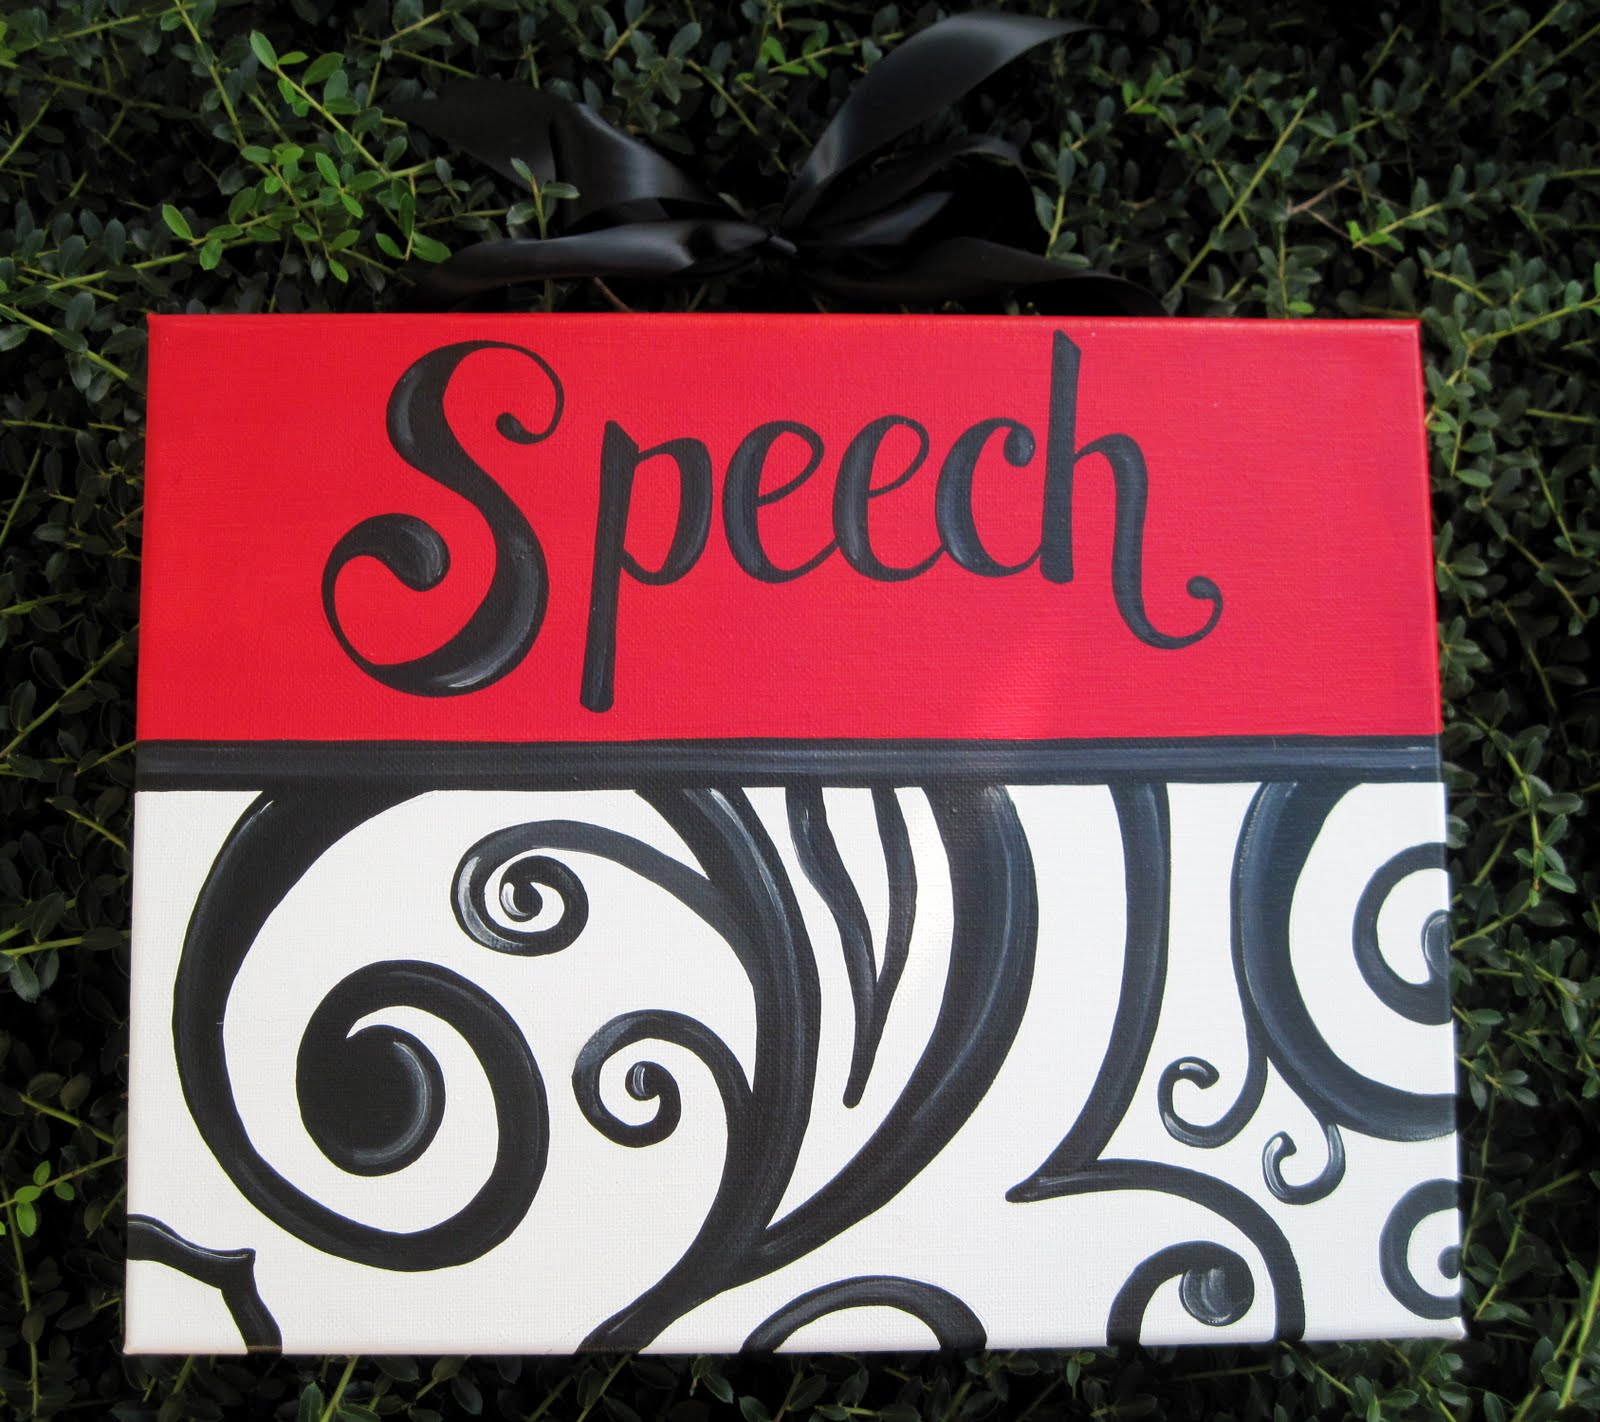 http://4.bp.blogspot.com/-3W0k_ZdFarU/TvkfFq_SVII/AAAAAAAAHDY/oEzRTLlcIr8/s1600/speech.JPG